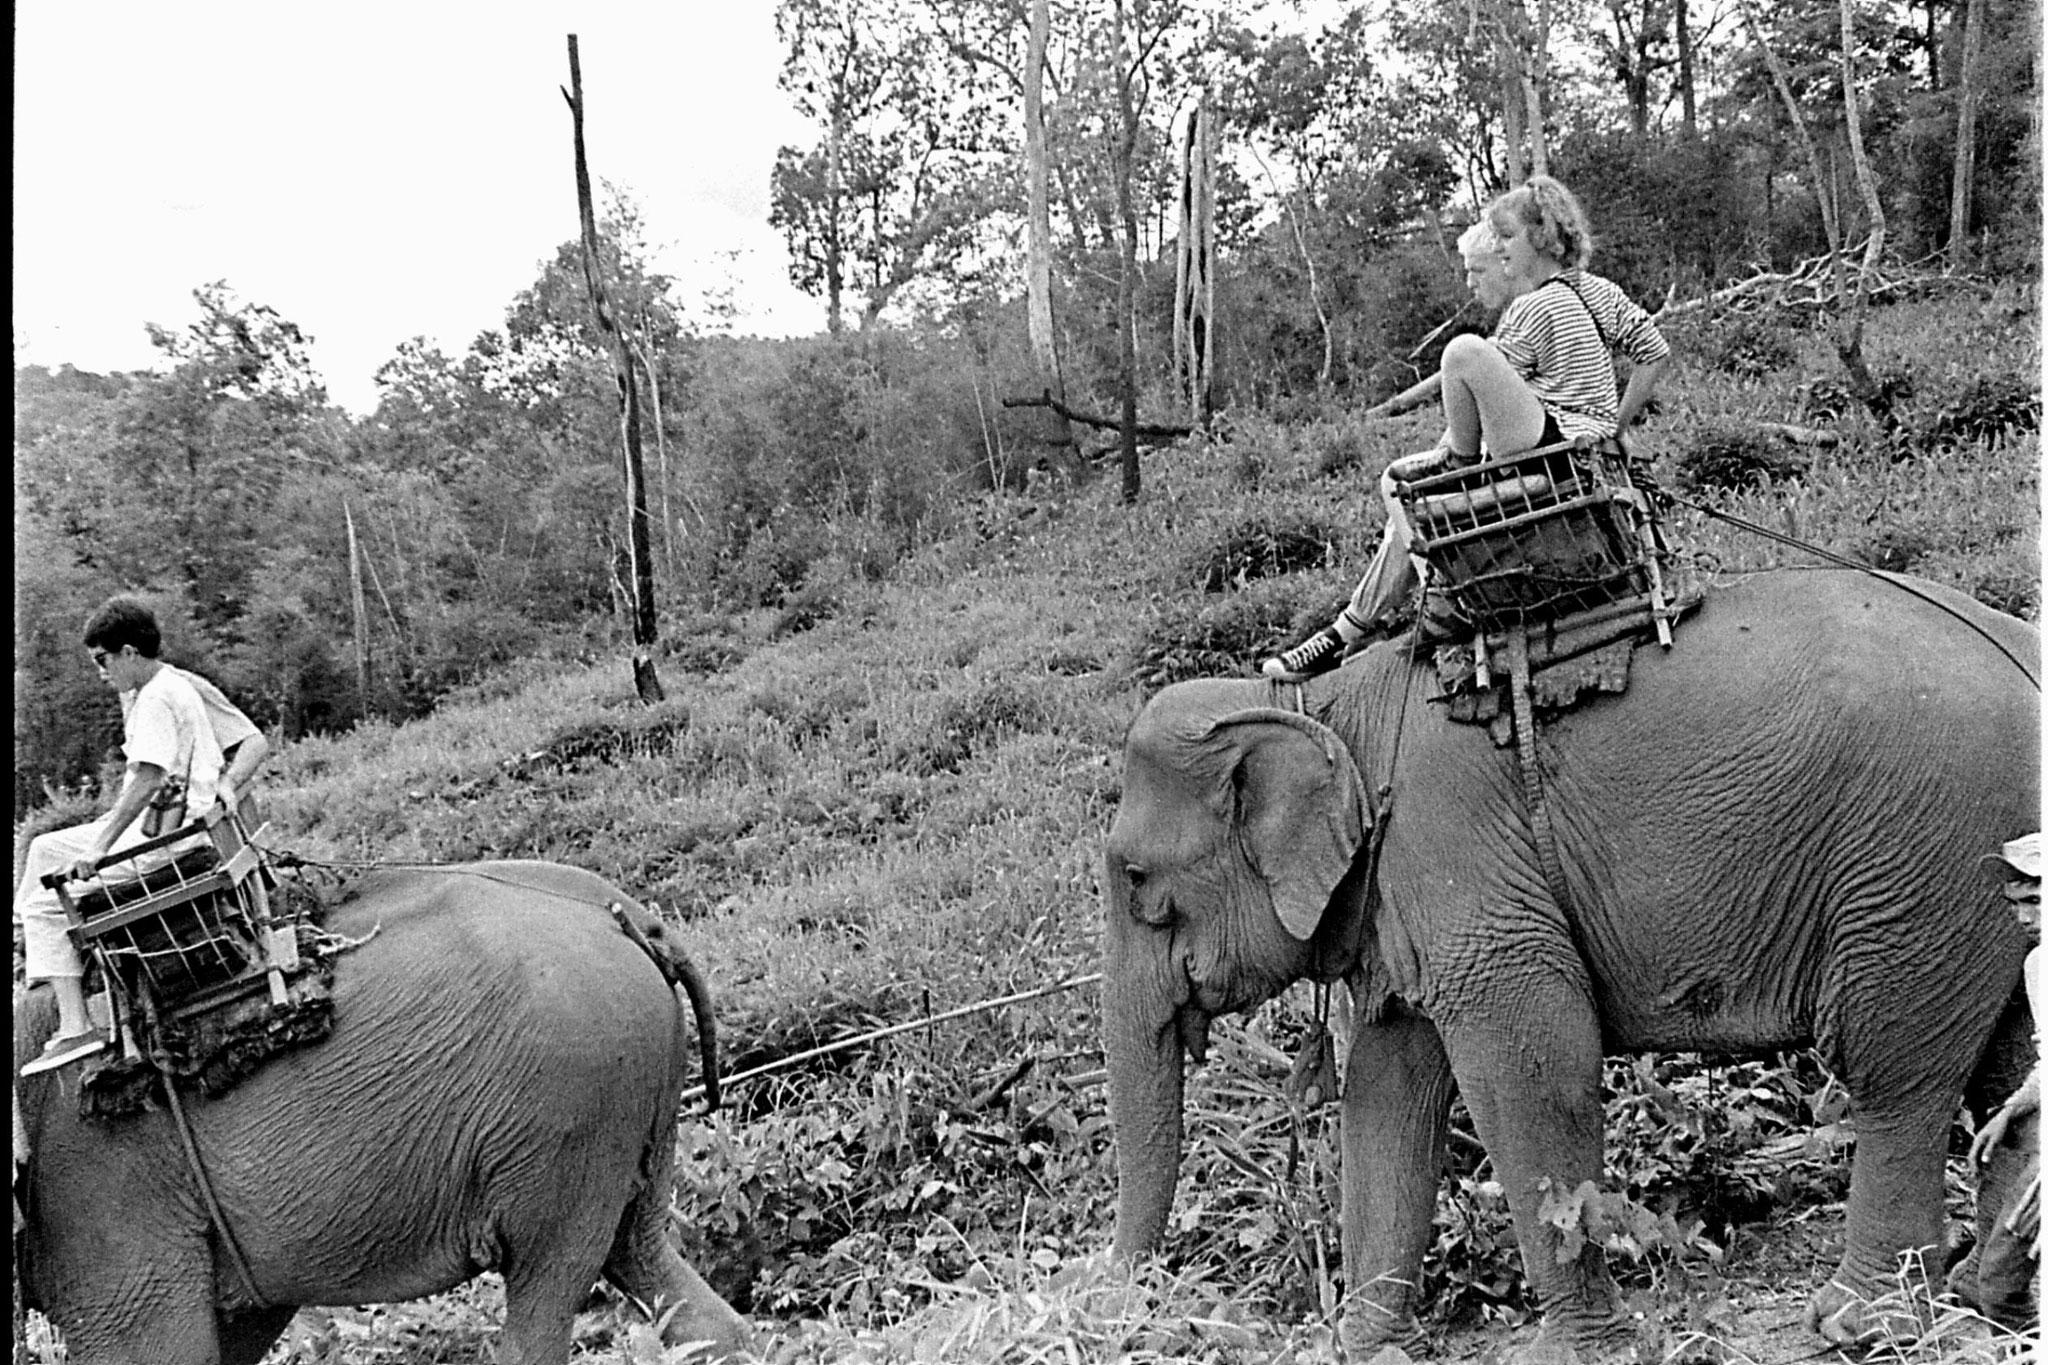 13/6/1990: 29: Last day of Trek, on elephant